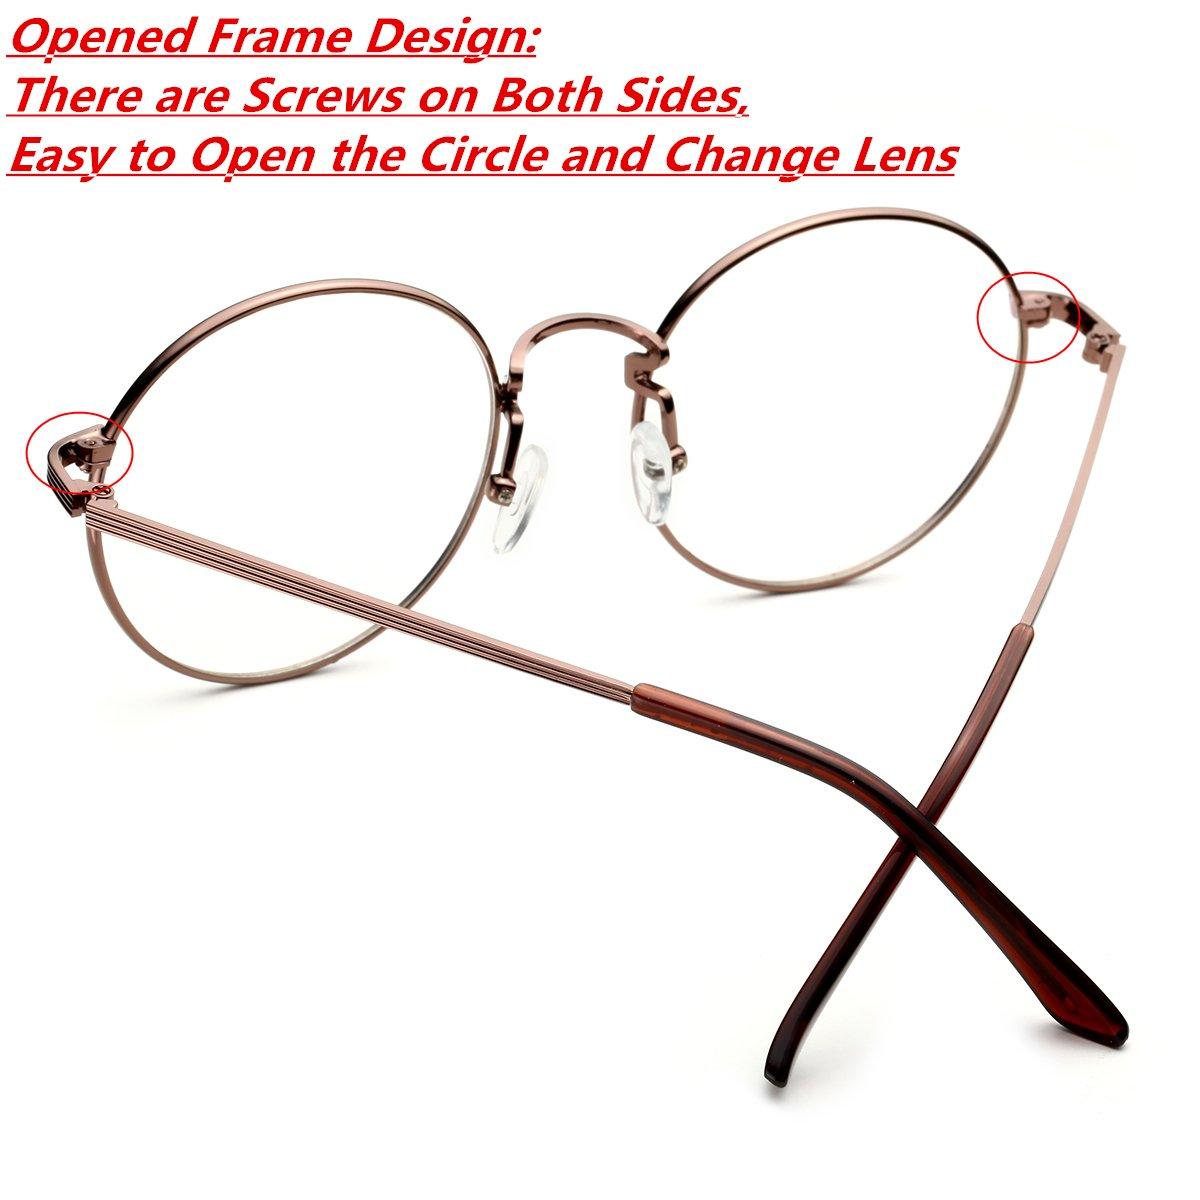 fcde4d511889 Amazon.com: PenSee Optical Metal Eyeglasses Round Circle Oversized Clear  Lense Eyewear Glasses Frames: Clothing